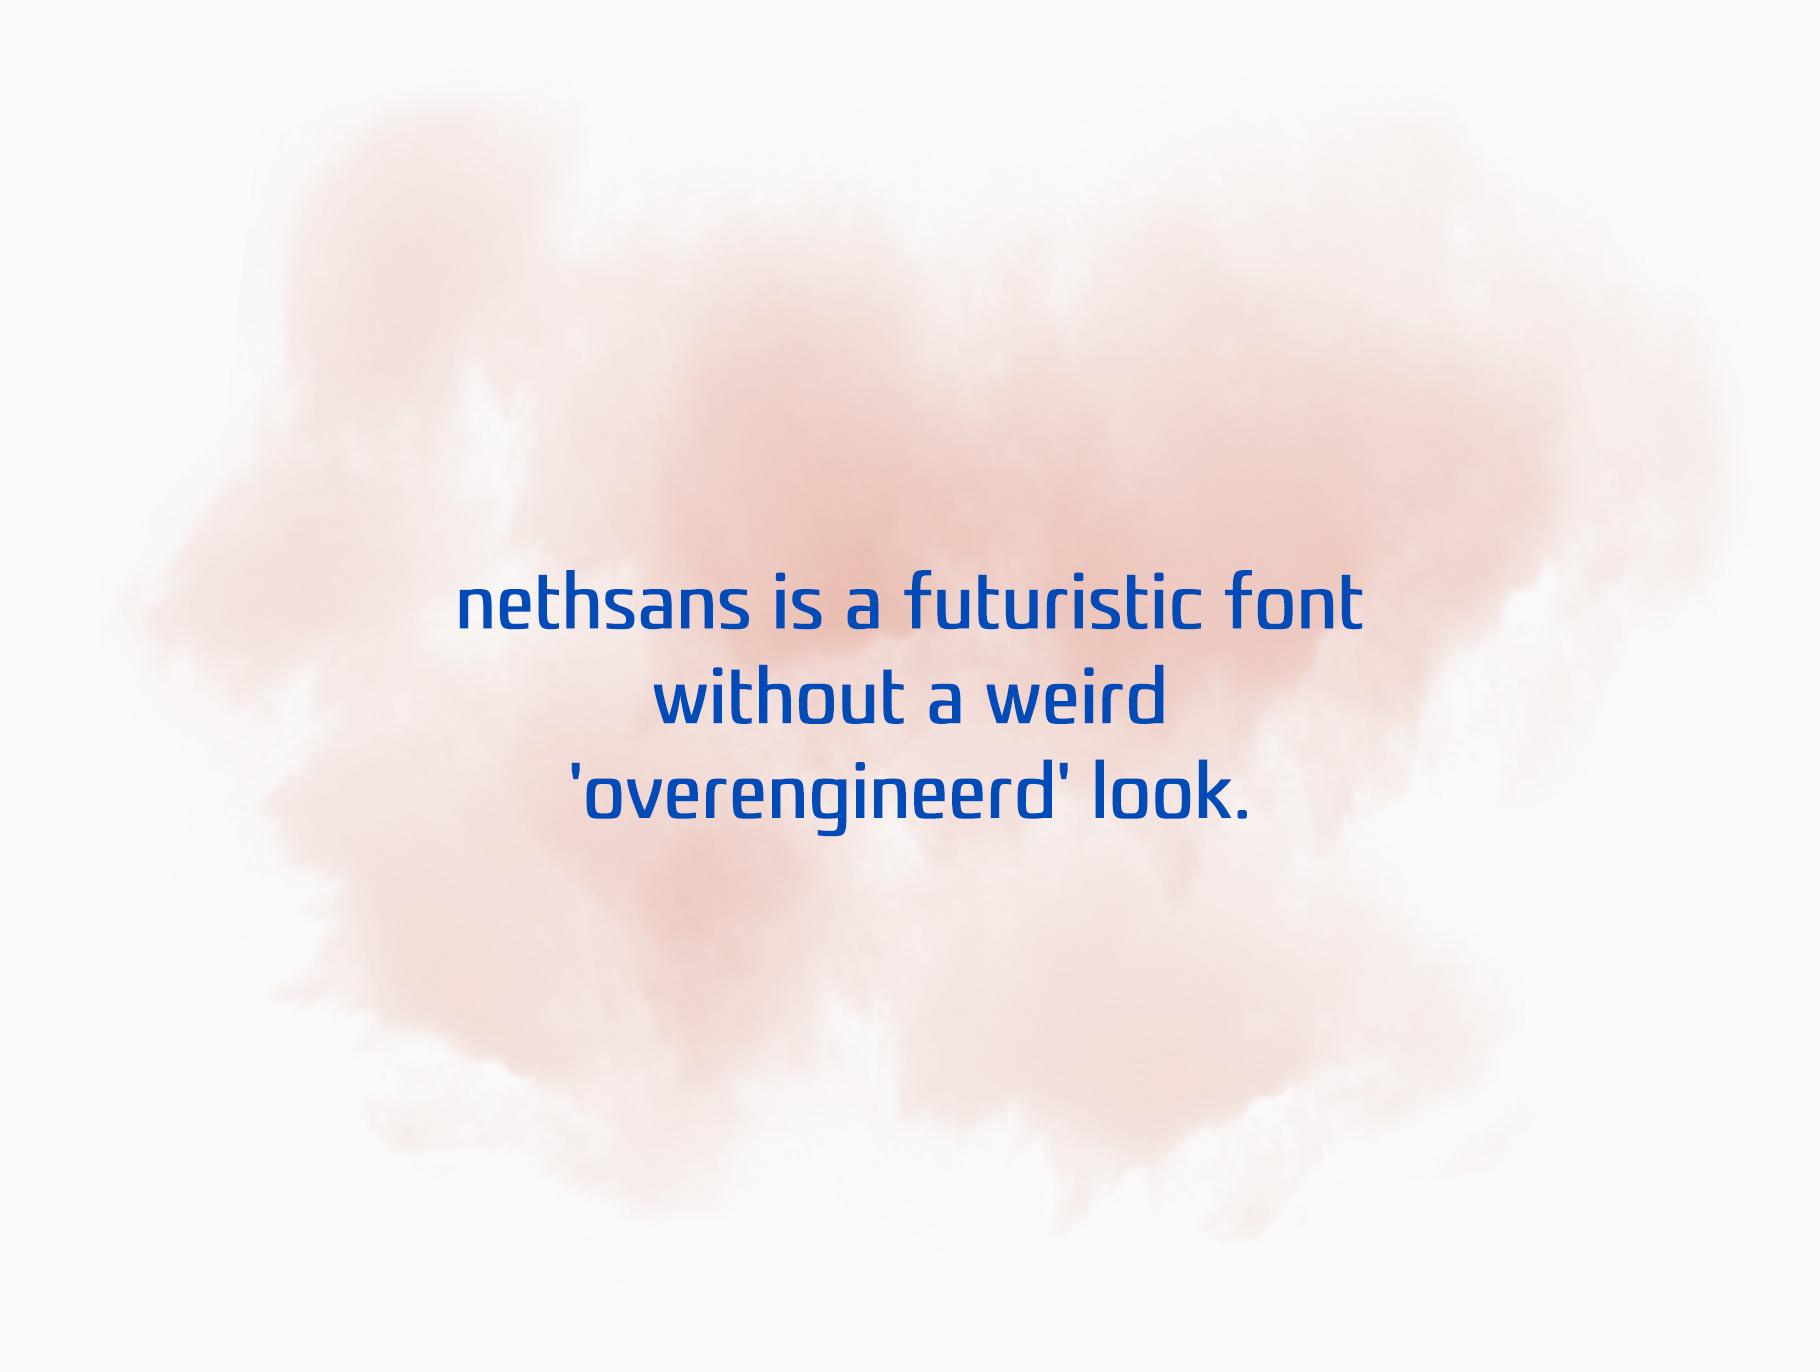 Nethsans Free Font - sans-serif